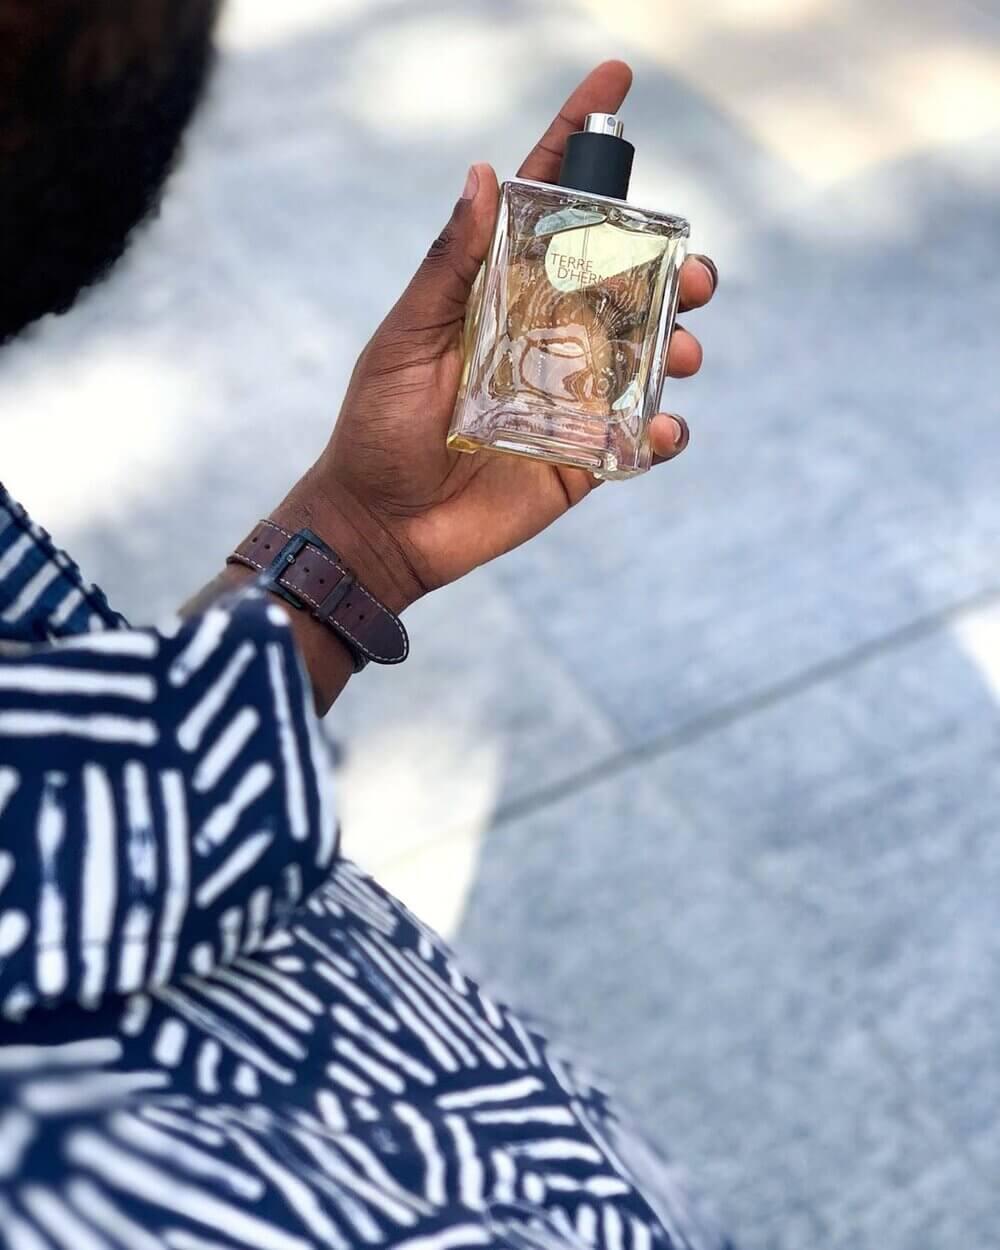 hand holding perfume